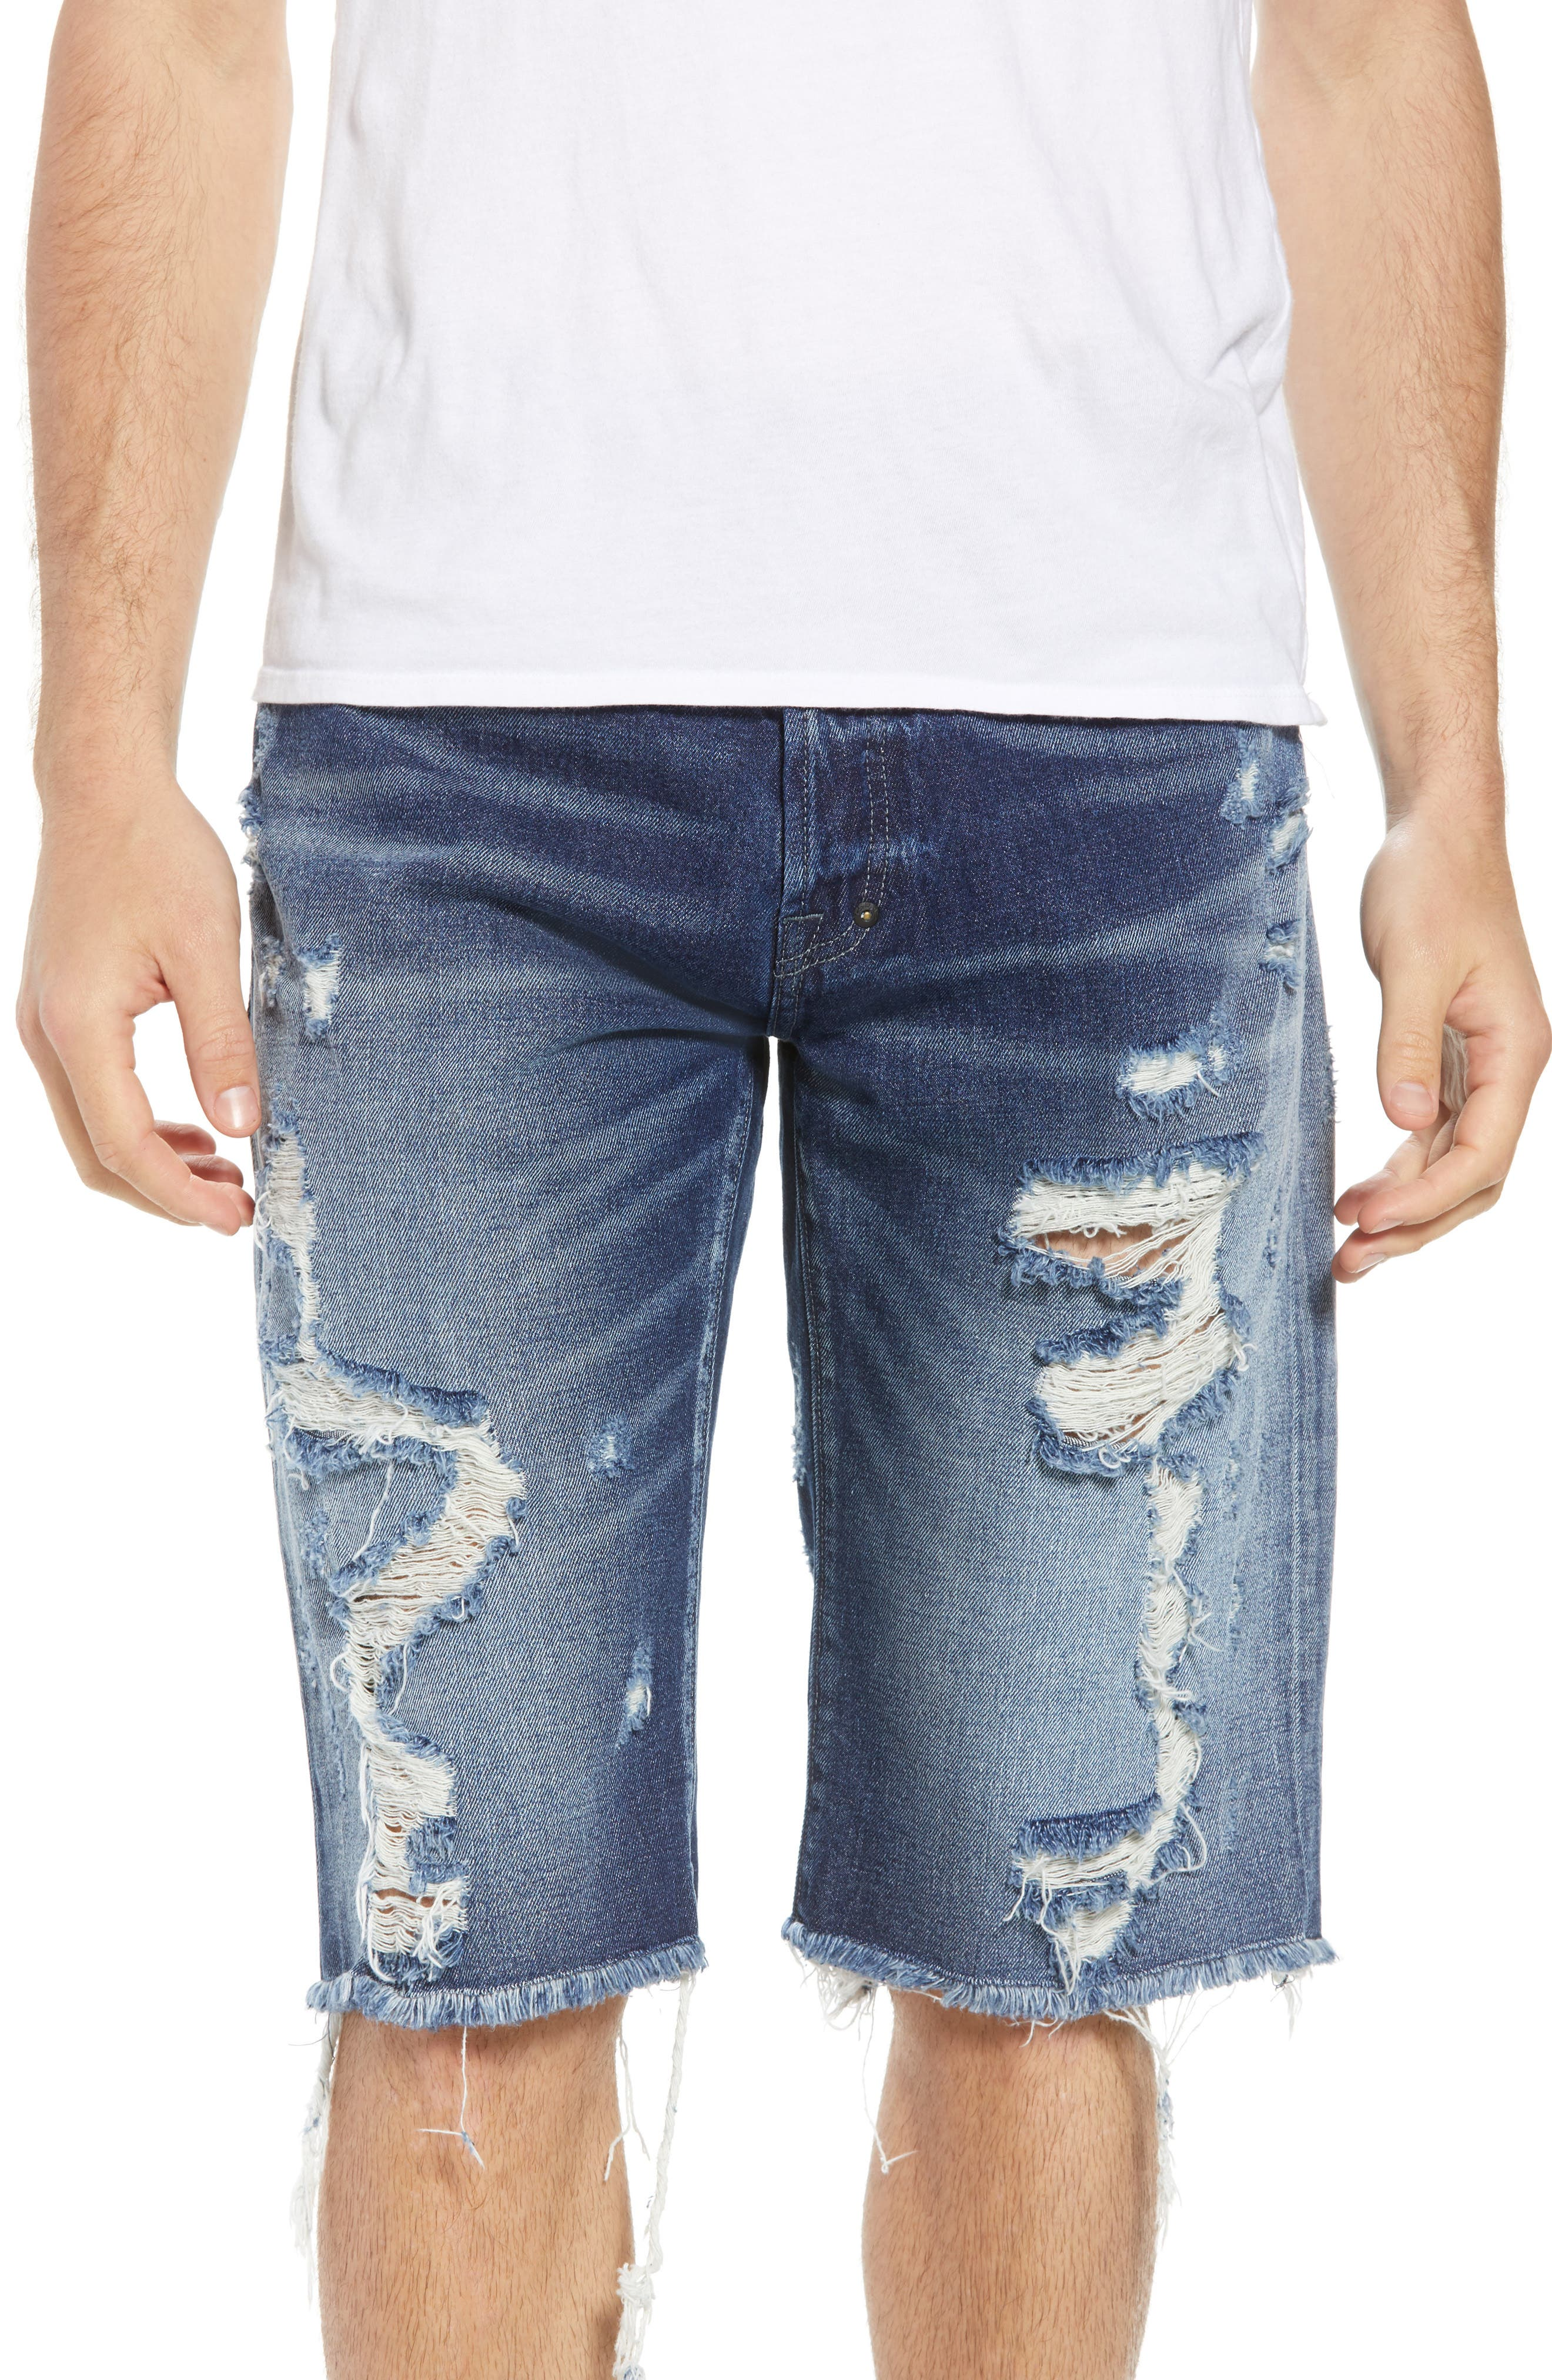 Challenger Regular Fit Shorts,                             Main thumbnail 1, color,                             NIMBLE